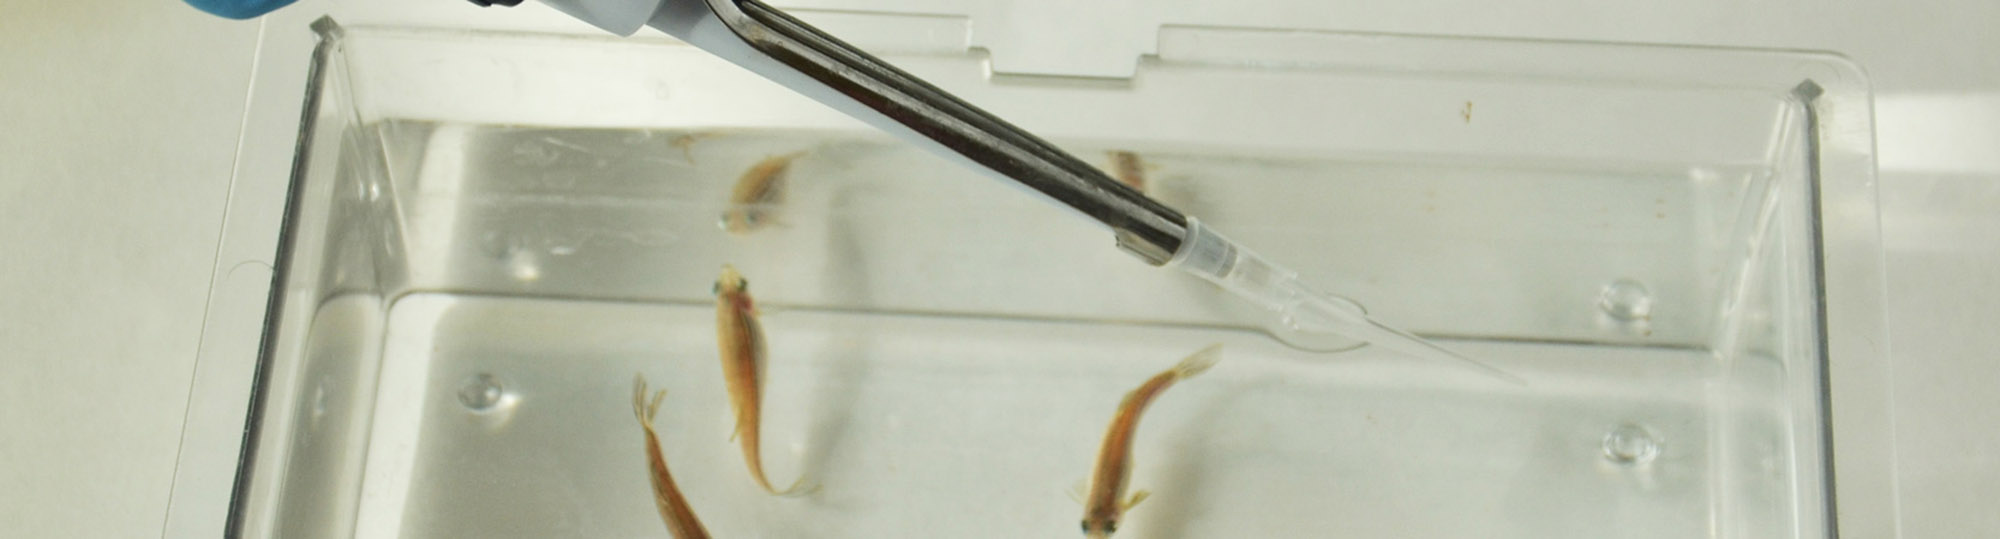 Zebrafish Drug Administration in Water